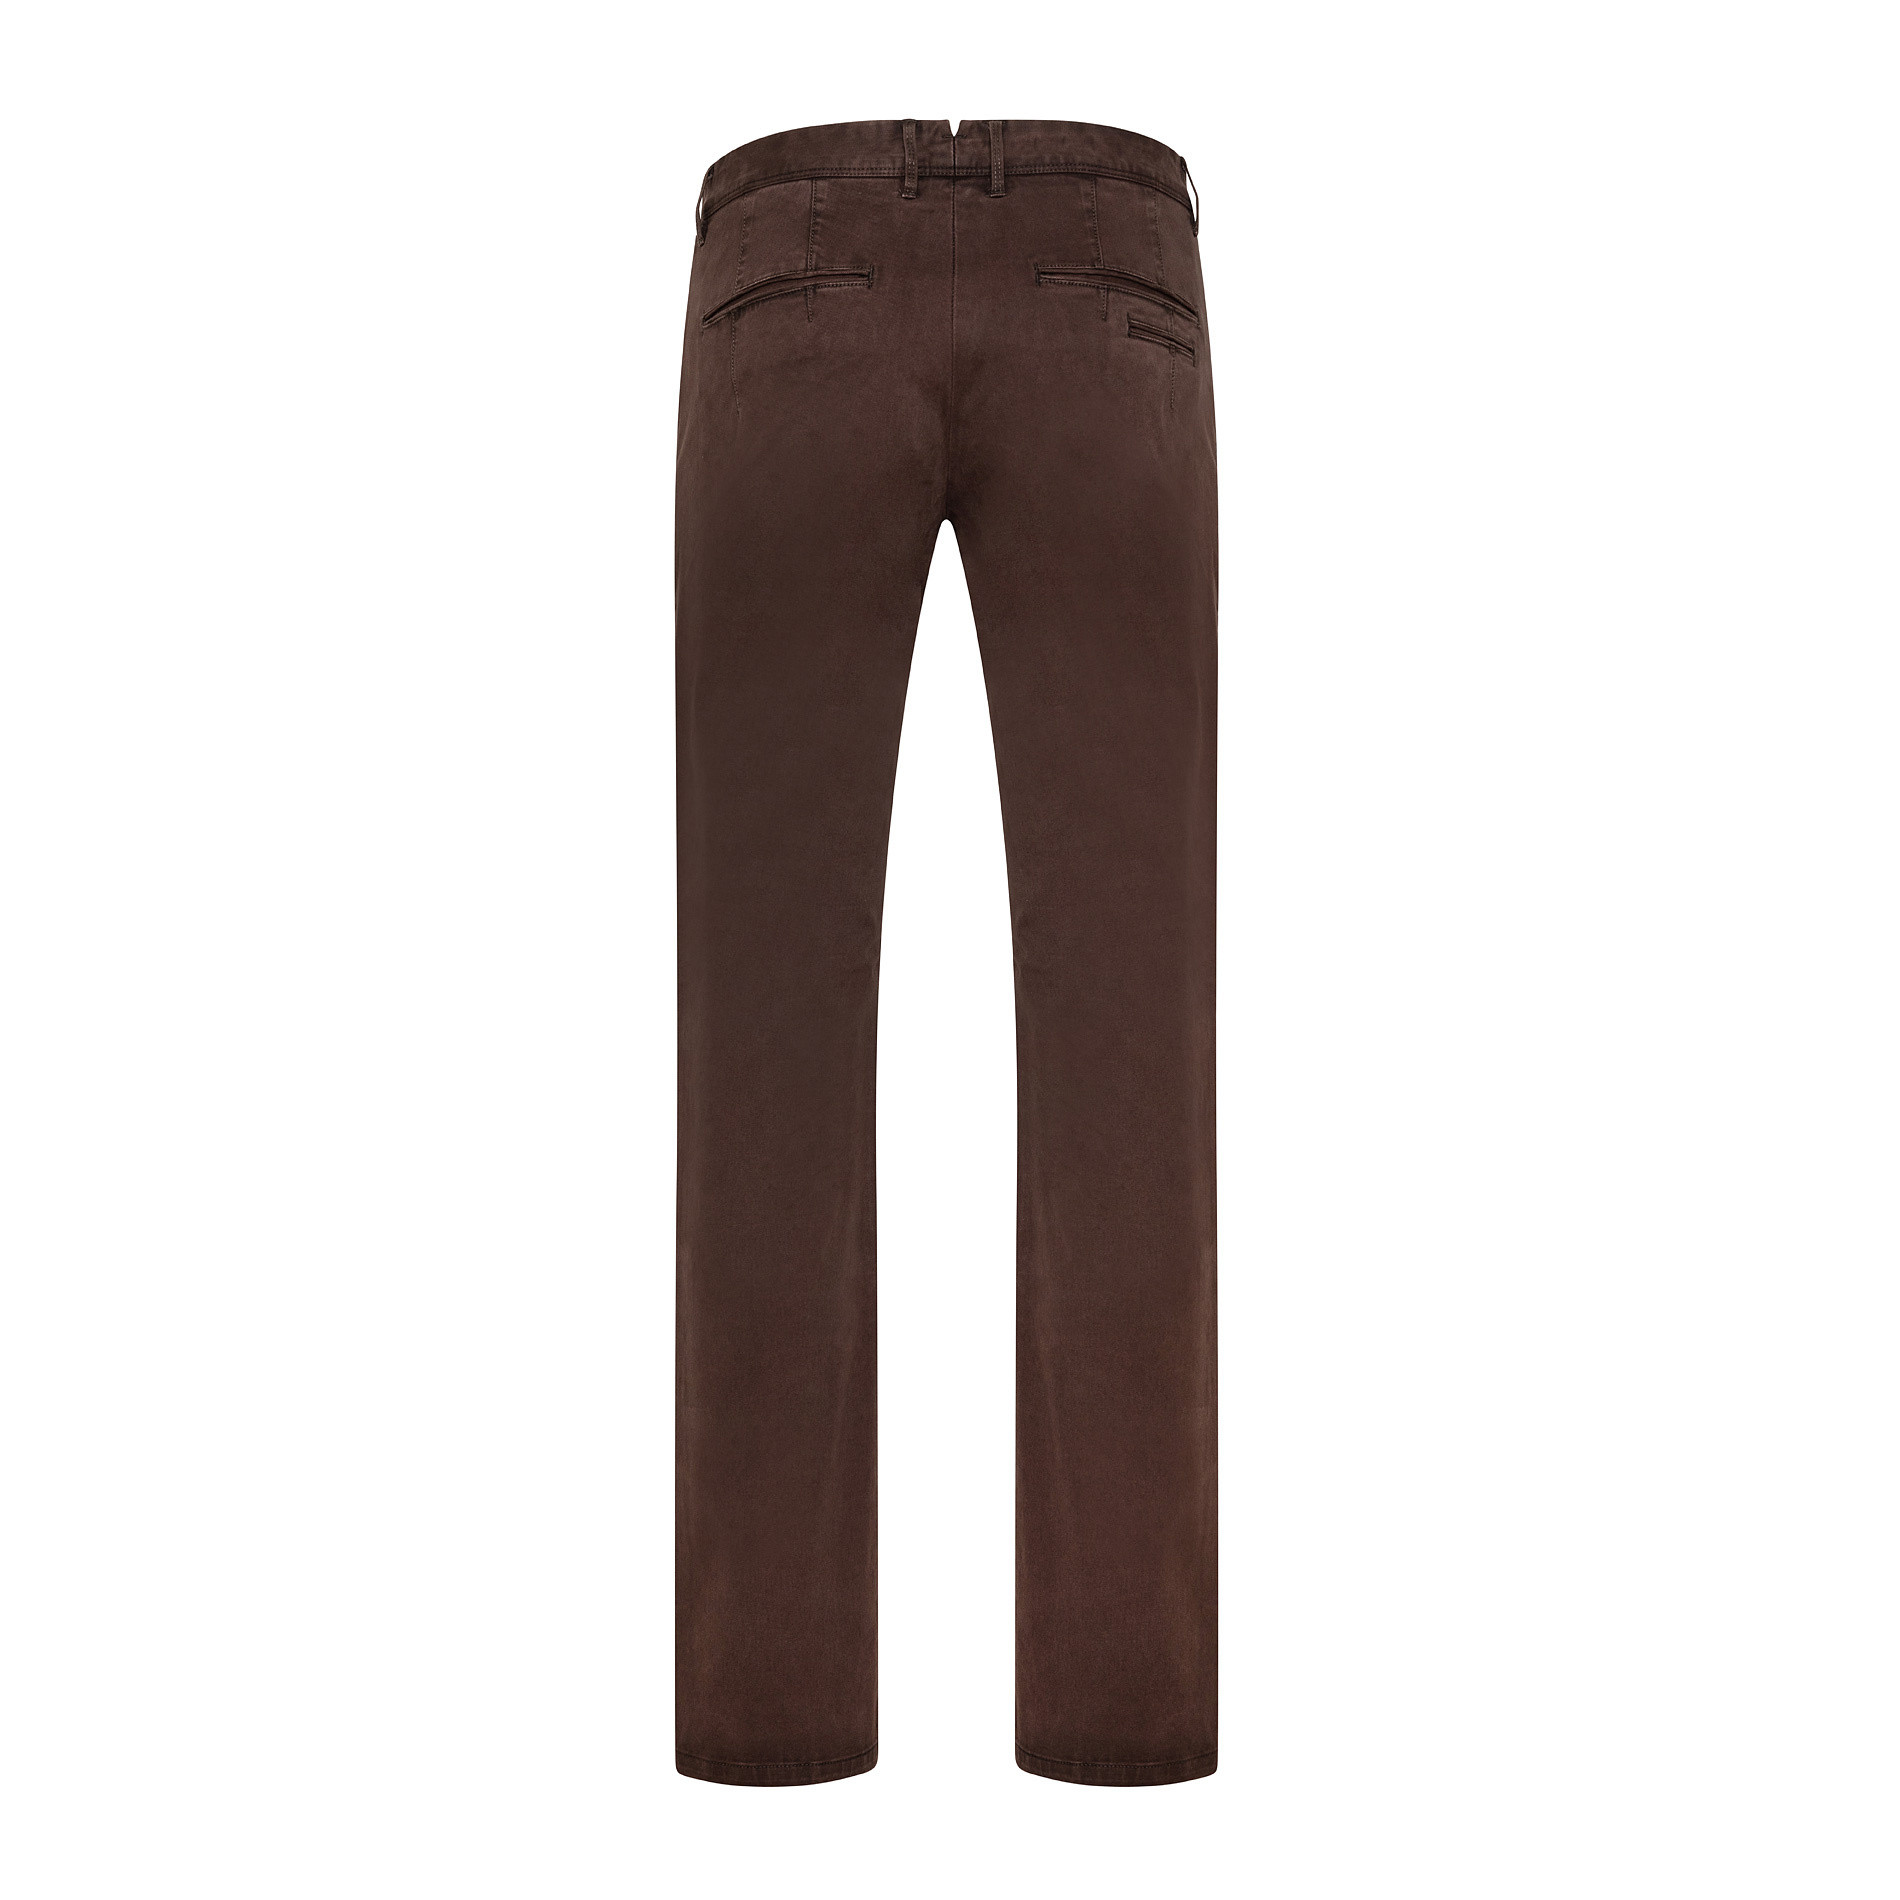 Pantaloni chino in tessuto stretch, Marrone, large image number 1